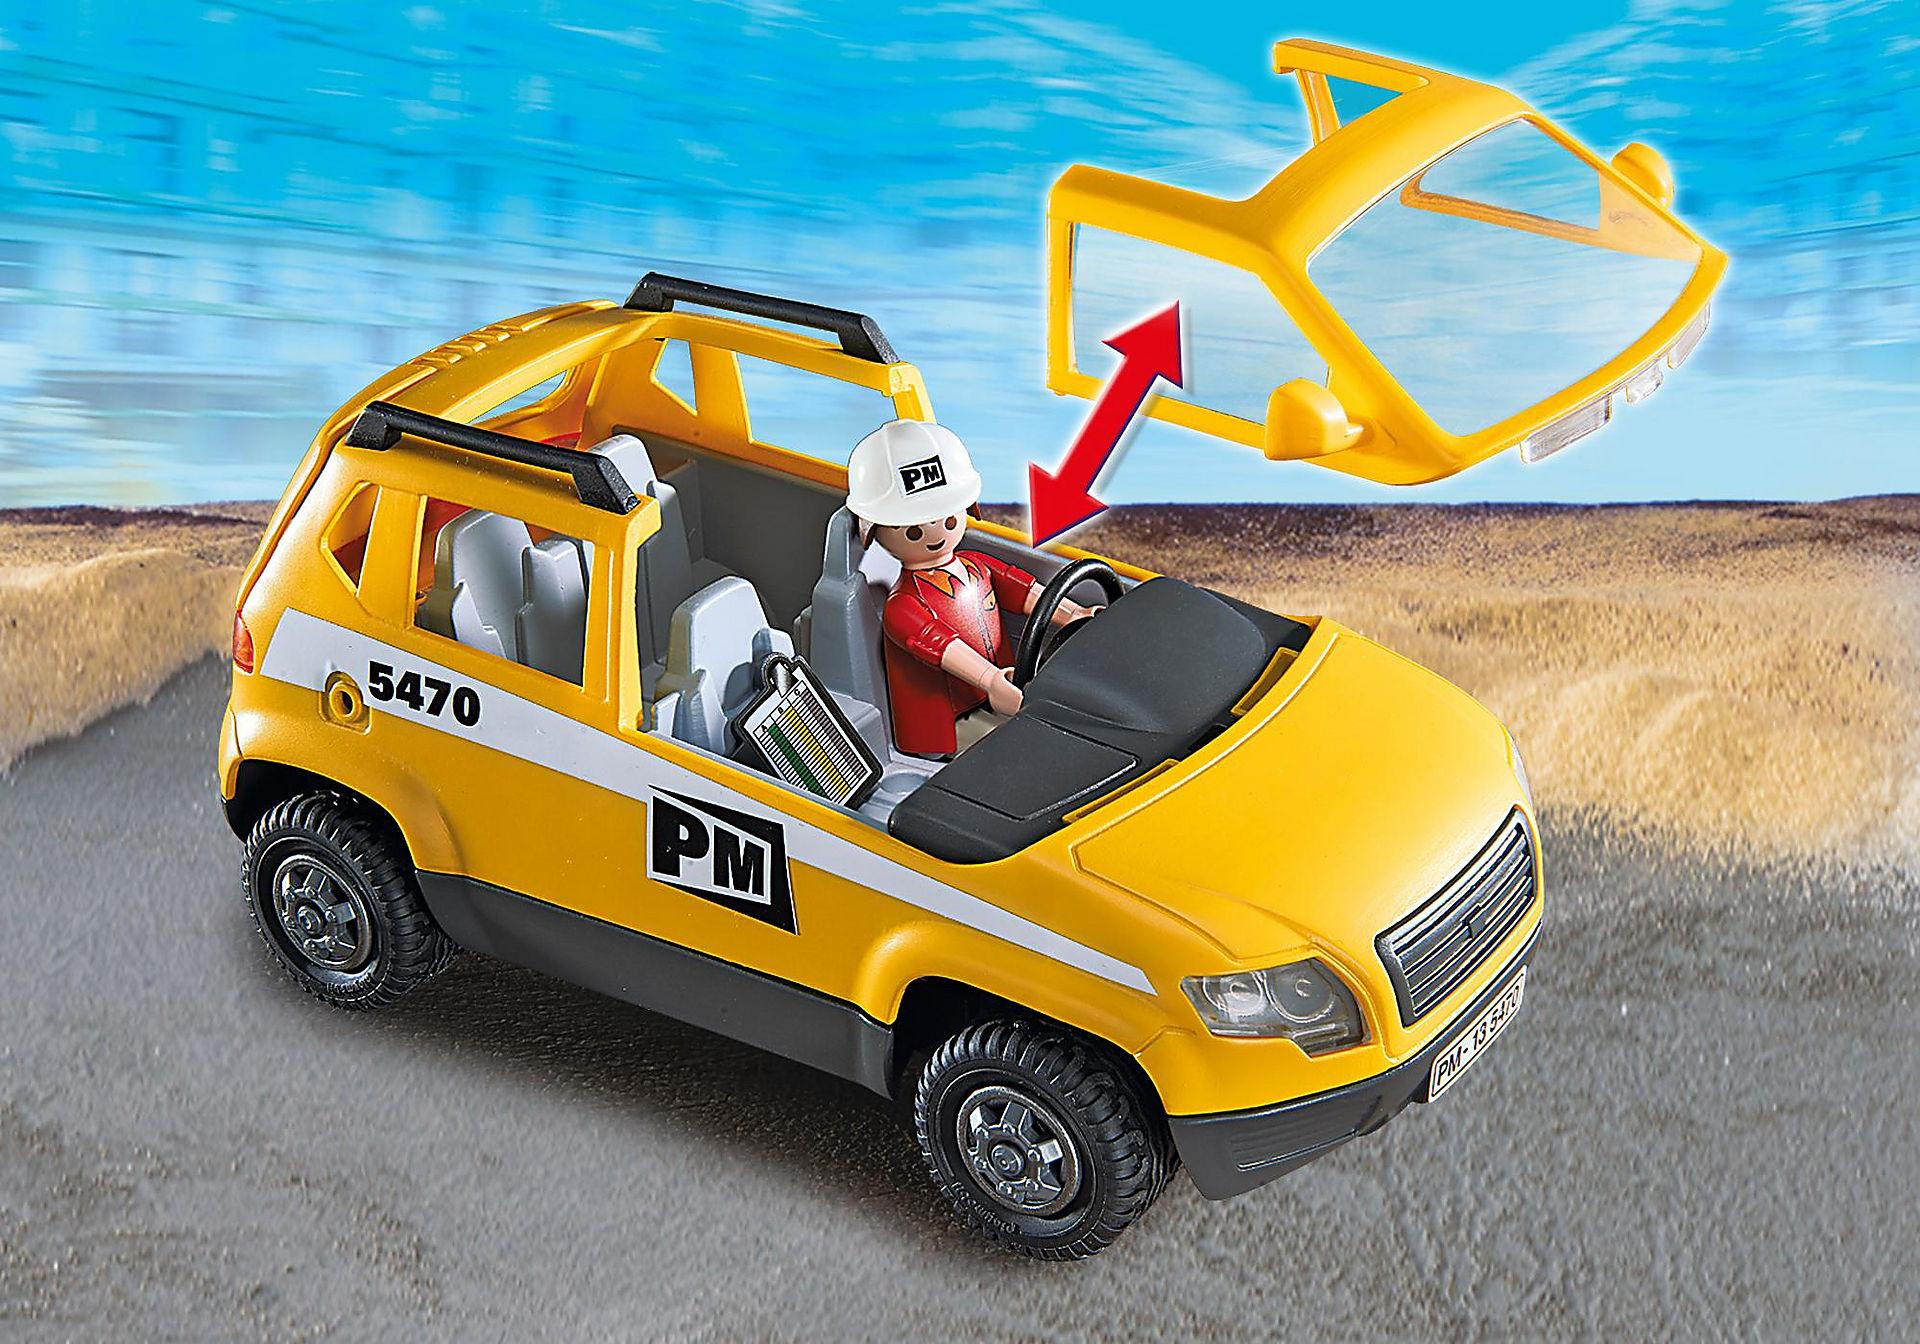 5470 Bauleiterfahrzeug zoom image4